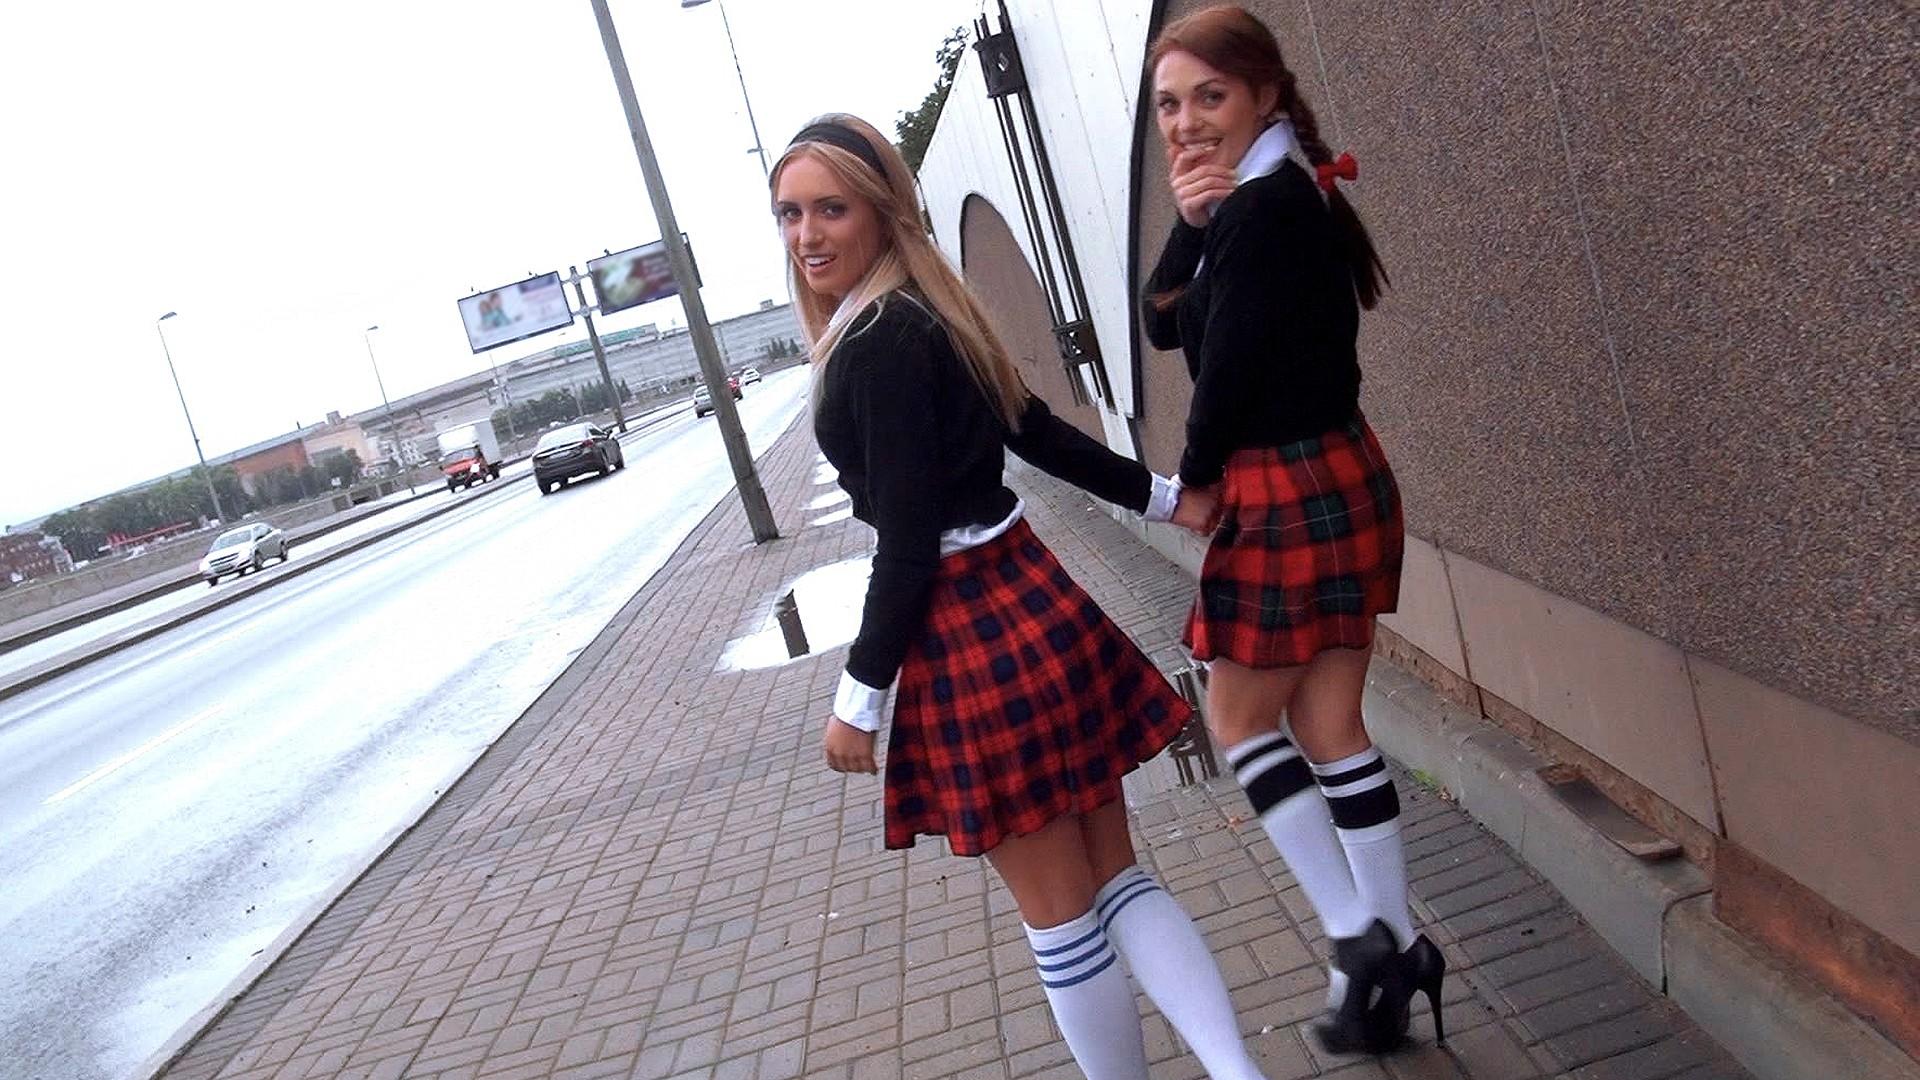 Schoolgirl Threesome - Stranded Teens